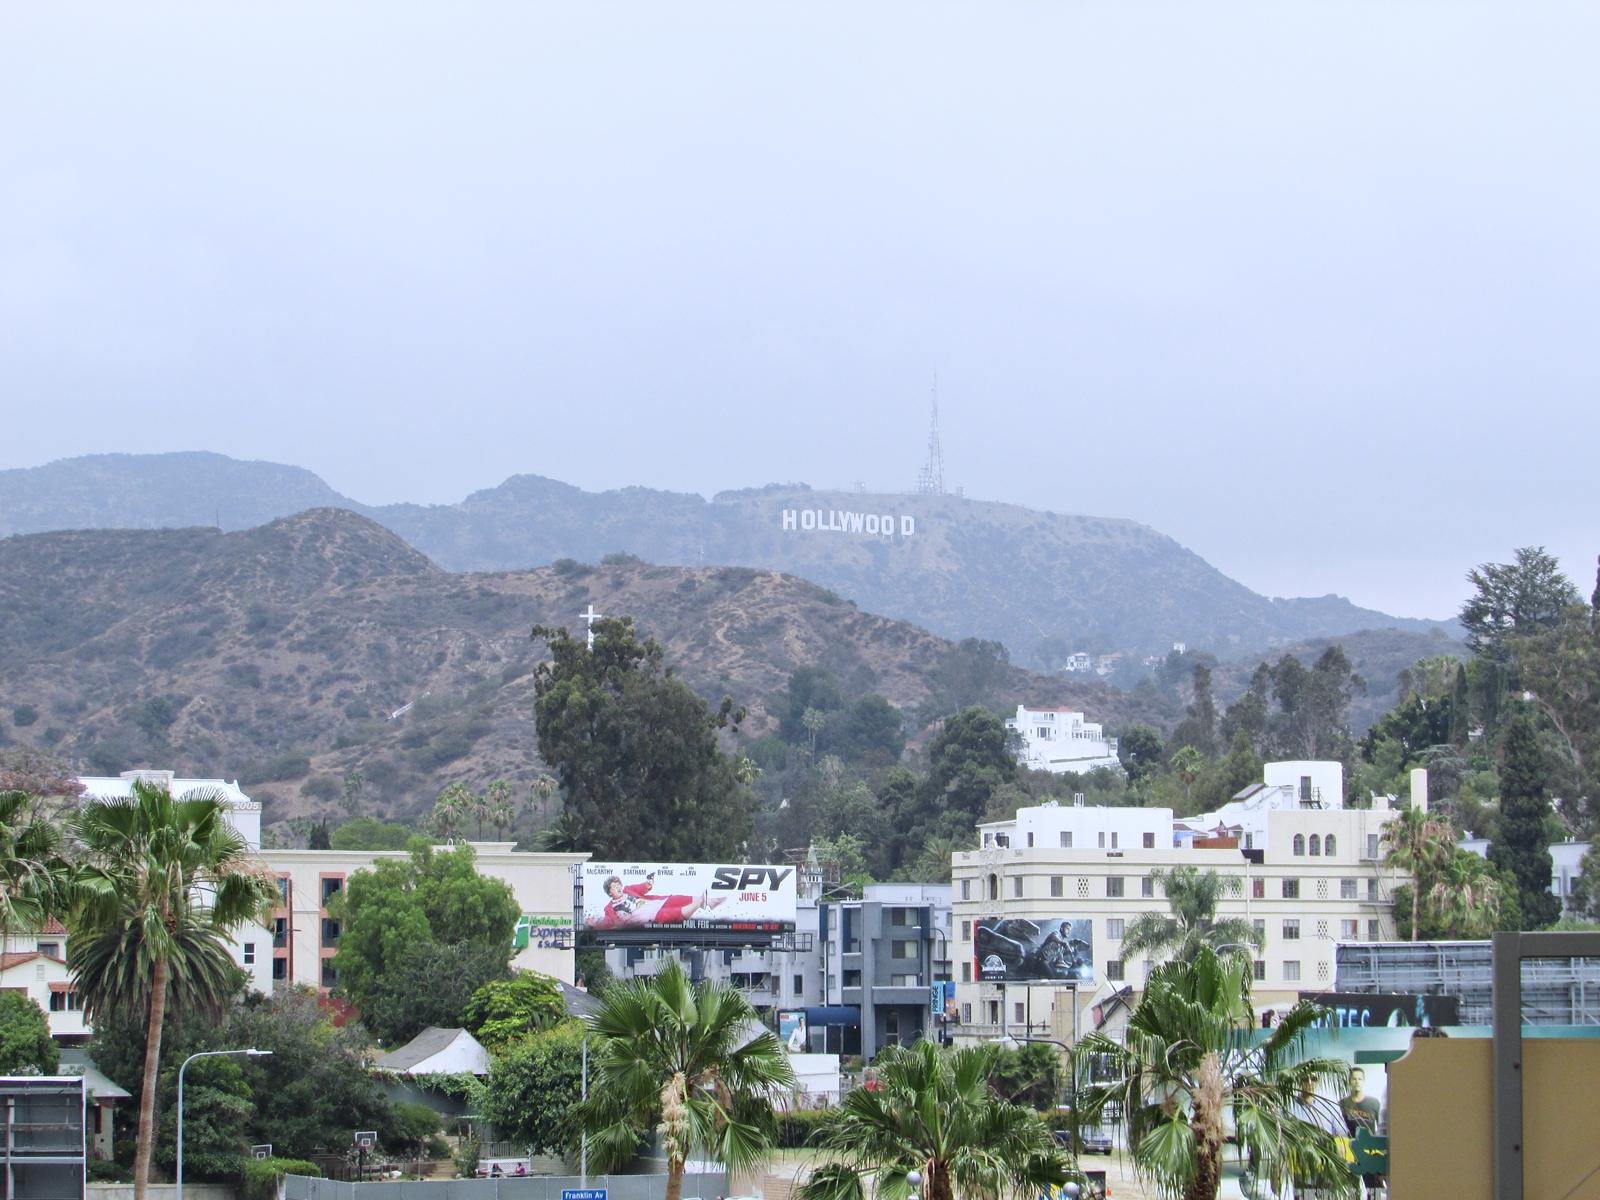 Hollywood Hills Sign - USA Roadtrip - Amerika Rundreise - Fashionladyloves by Tamara Wagner - Travelblog